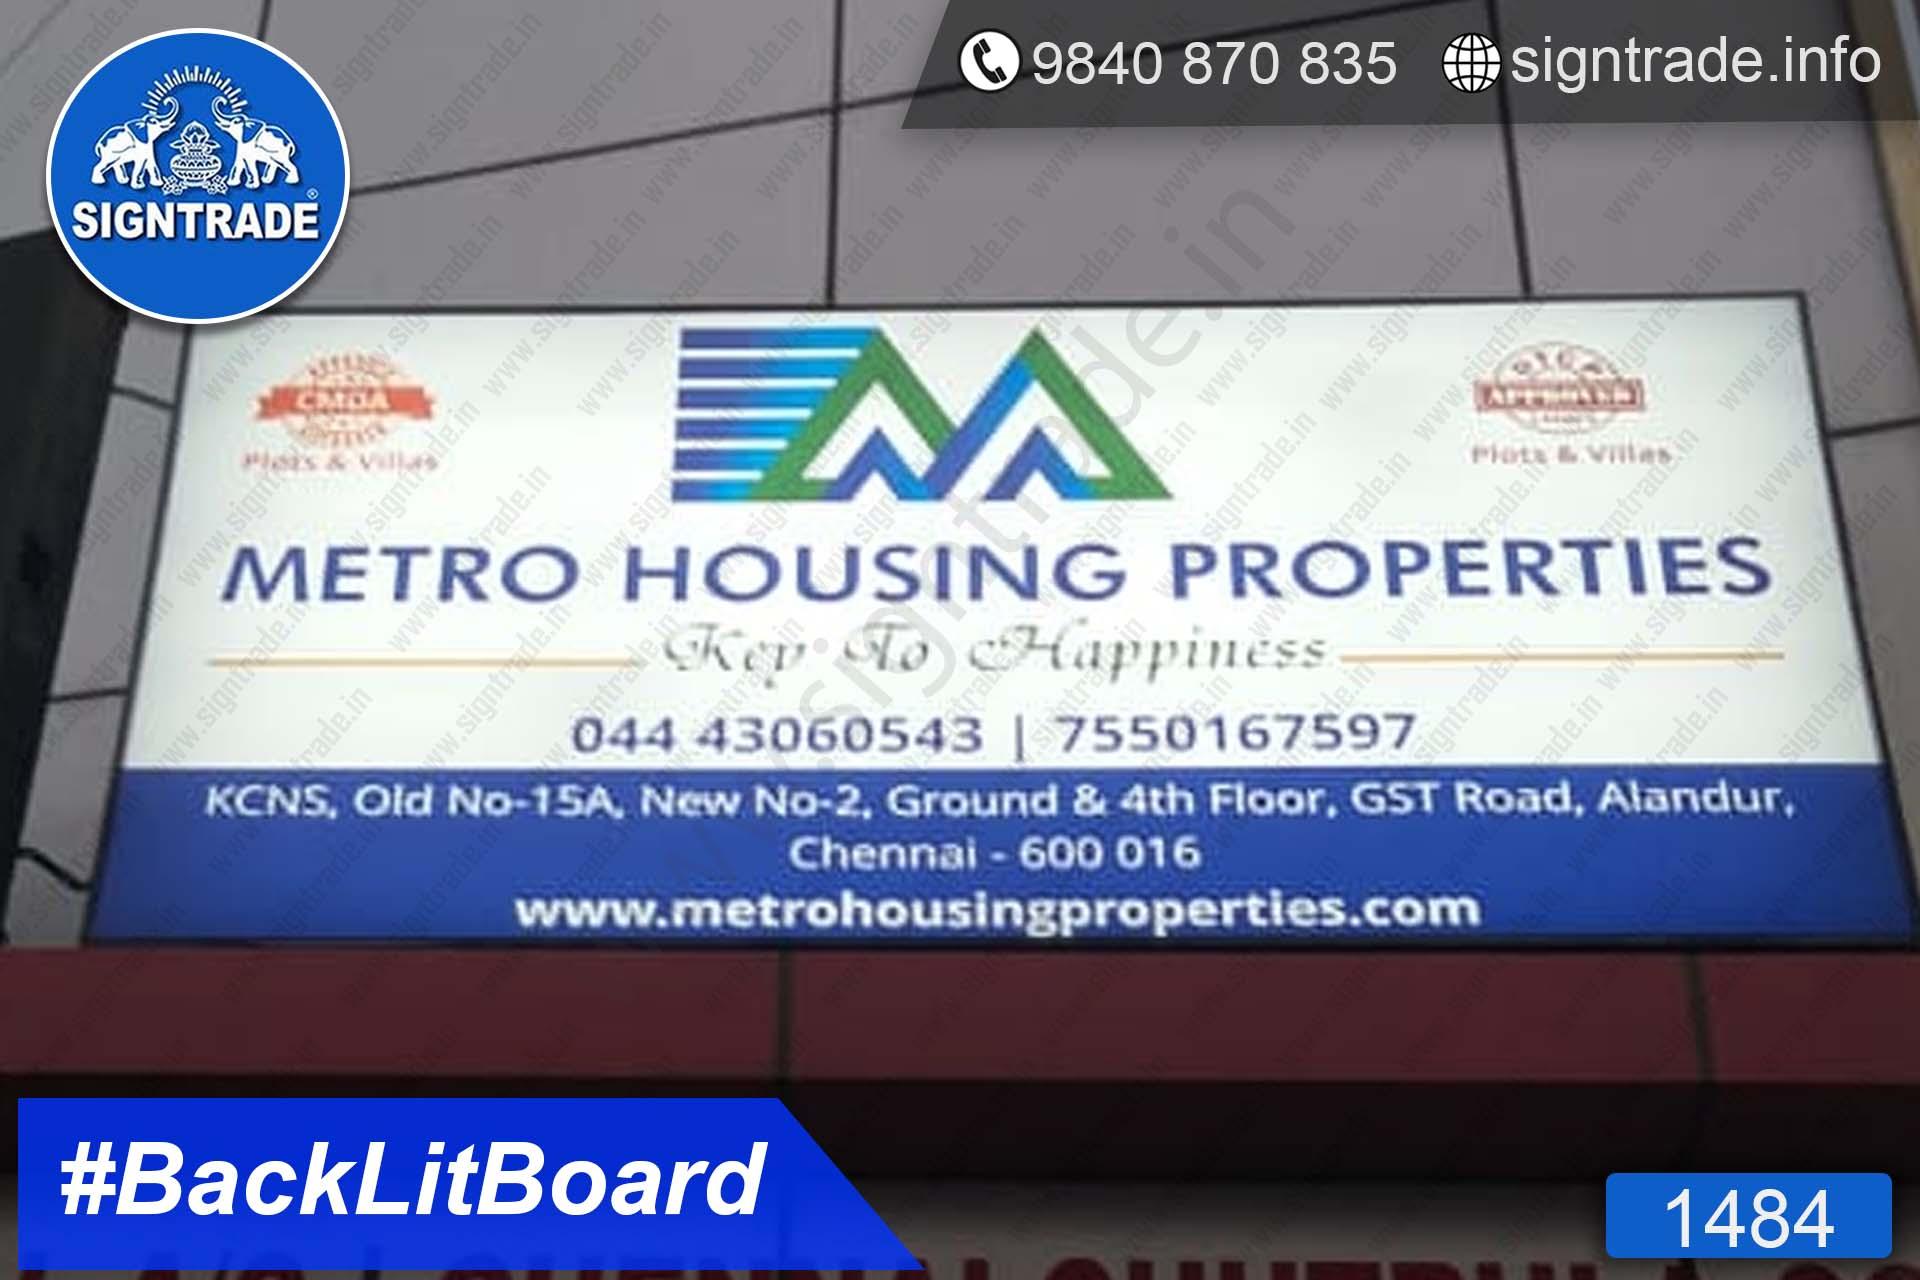 Metro Housing Properties - Alandur - Chennai - SIGNTRADE - Digital Printing Service, BackLit Flex Board Manufacturers in Chennai